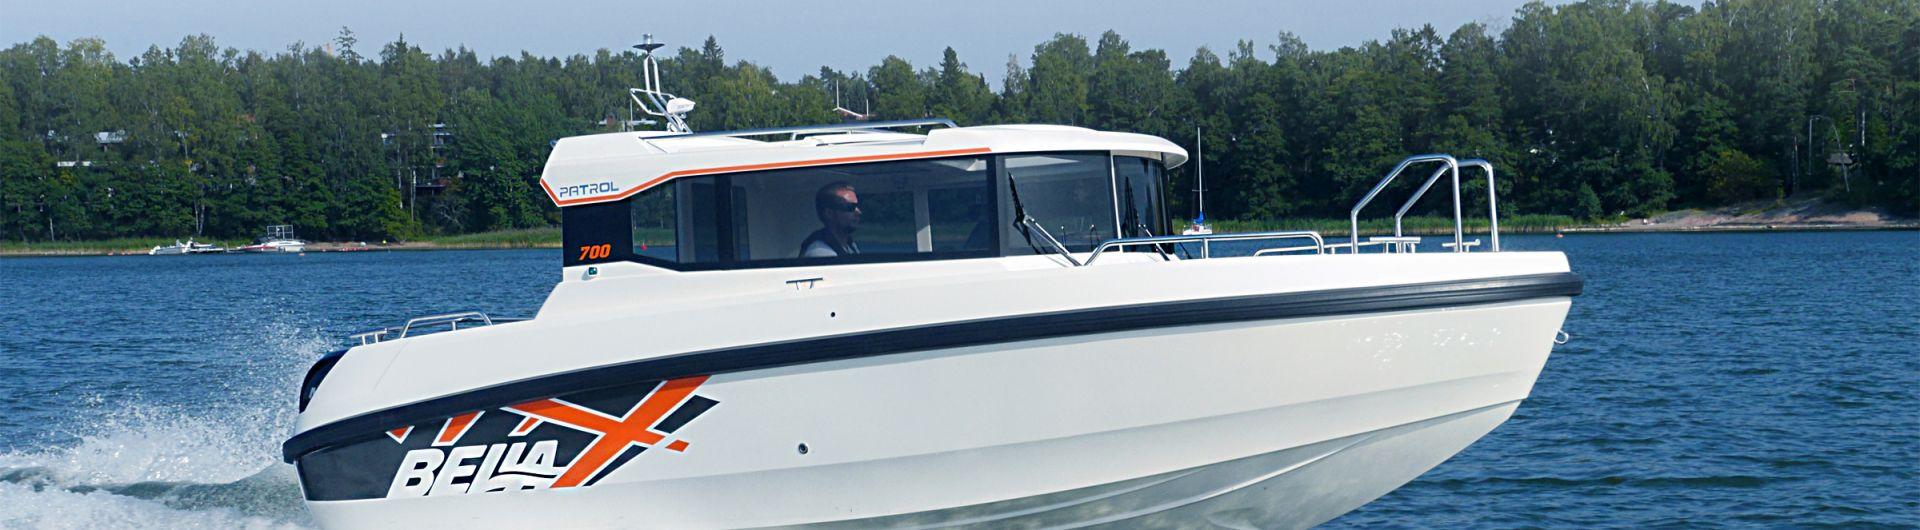 Sportboot Bella 700 Patrol 1